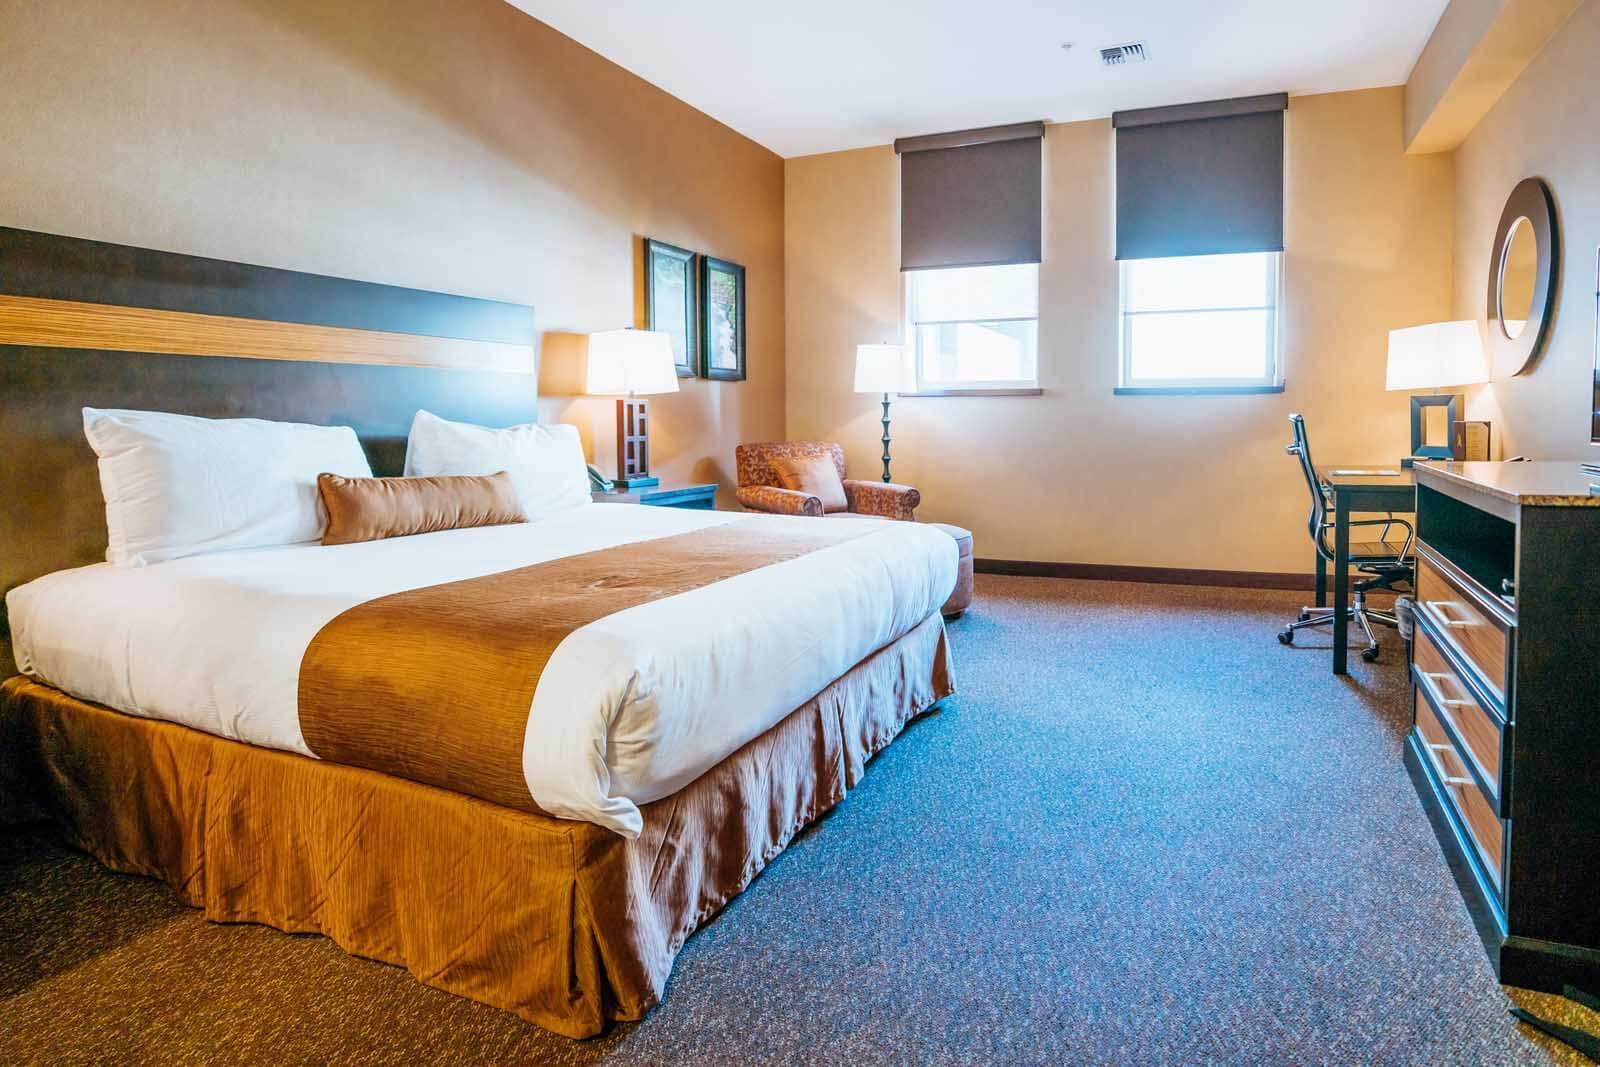 Room at Hotel Maison in Yakima